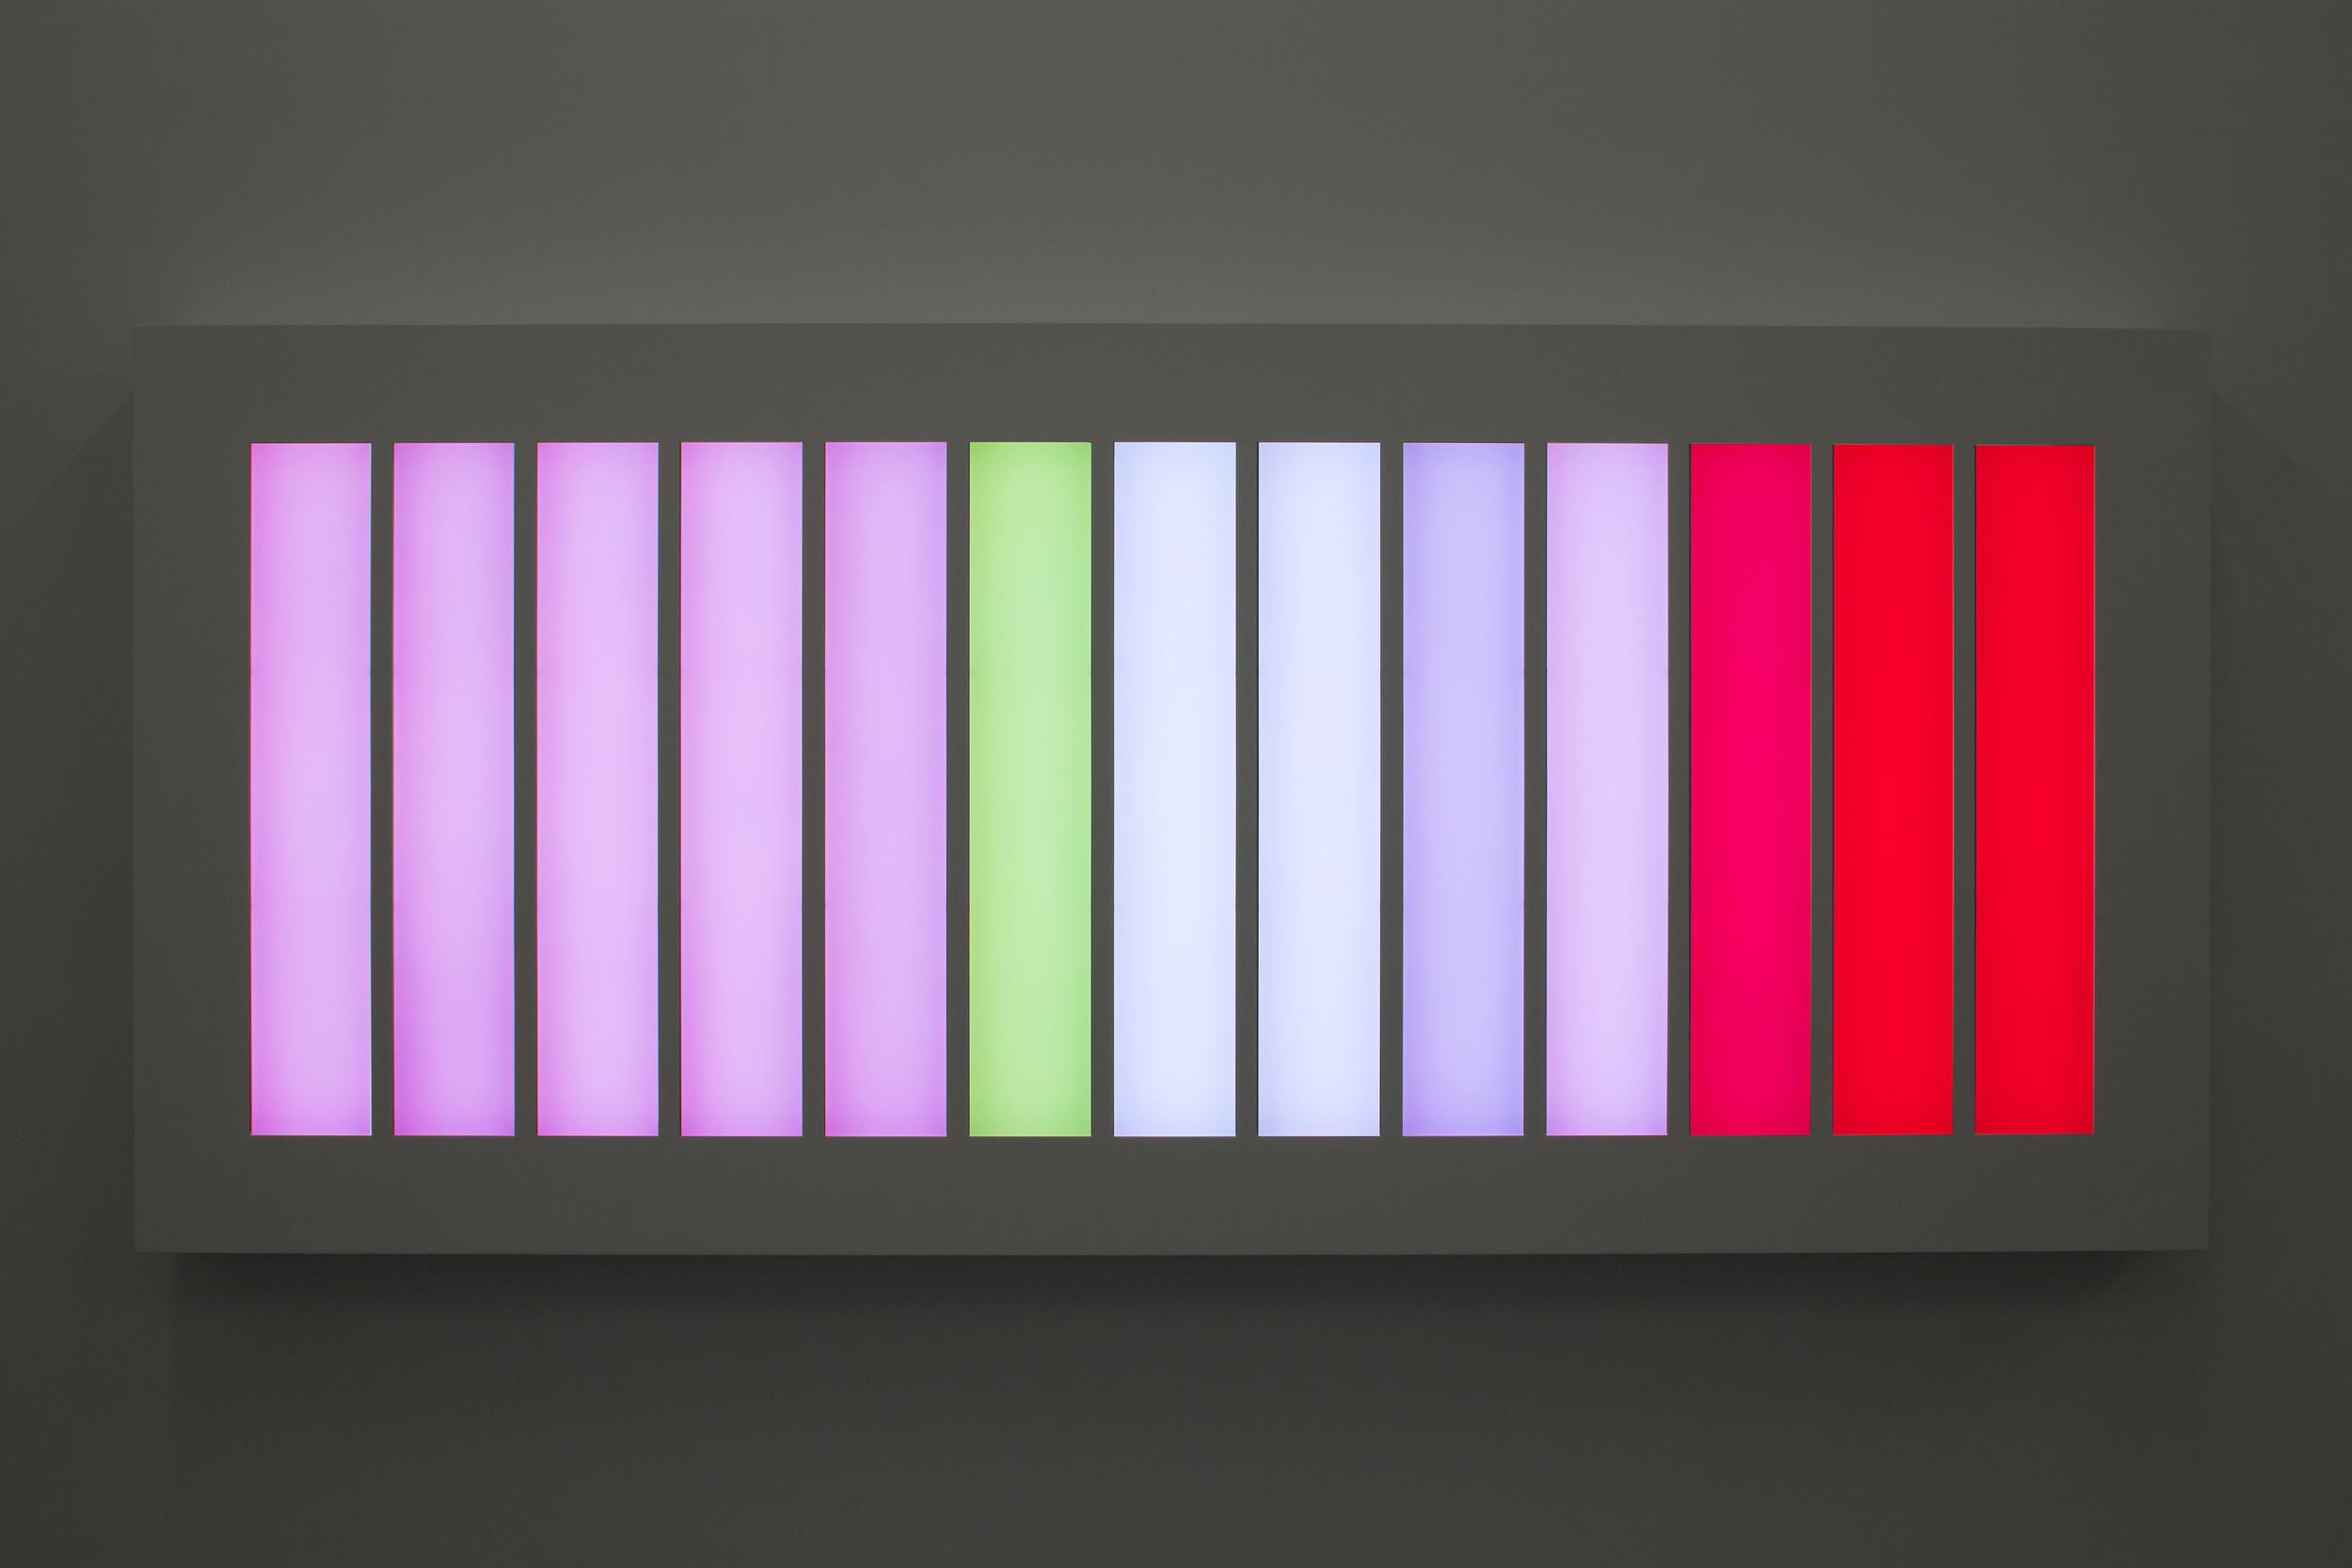 Coded Spectrum, 2012